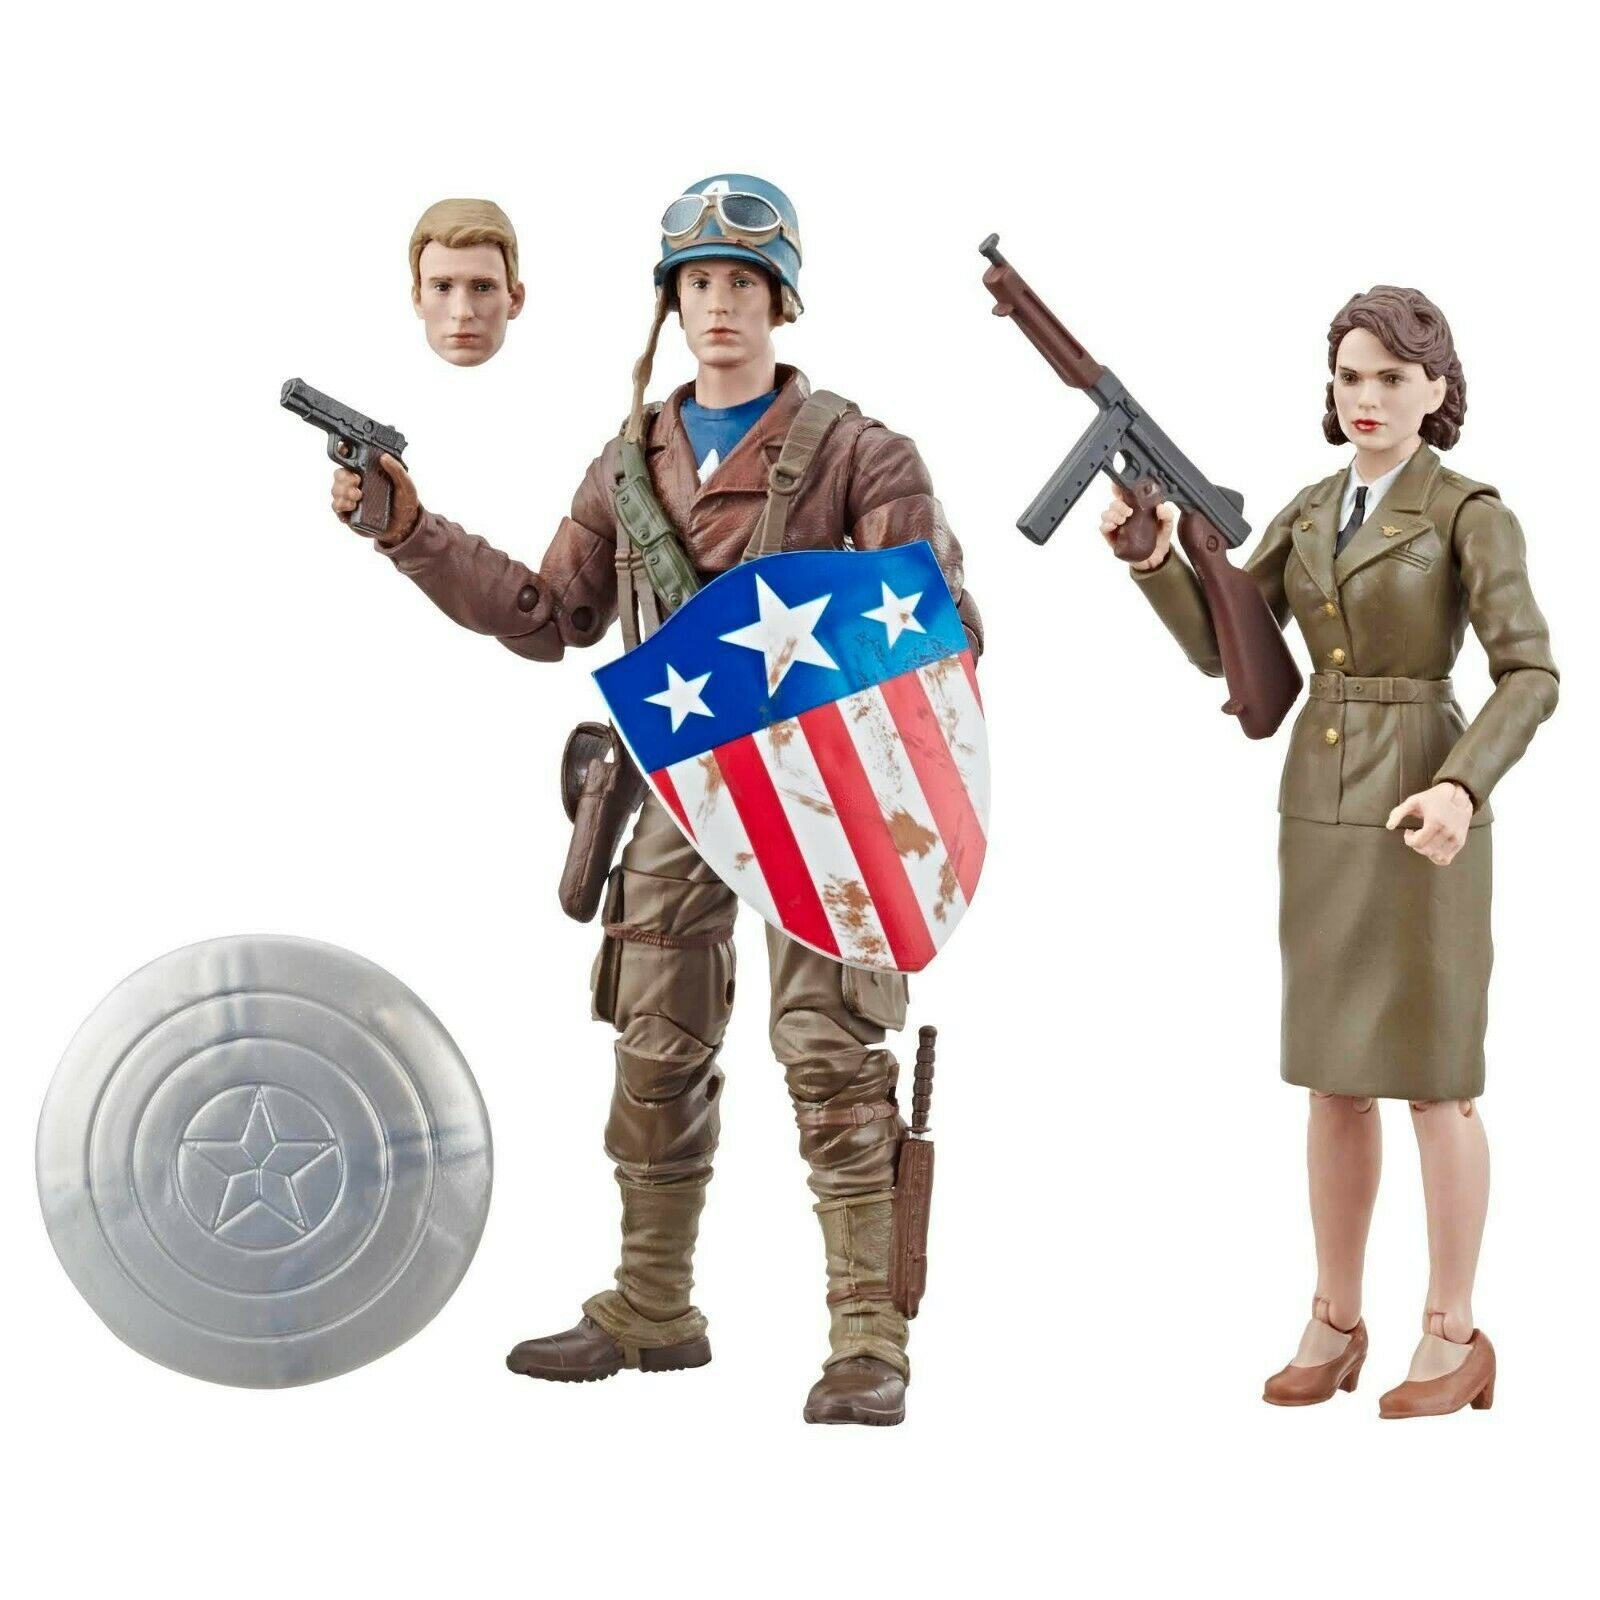 Marvel Legends Captain America & Peggy Carter 2 Pack Movie 6